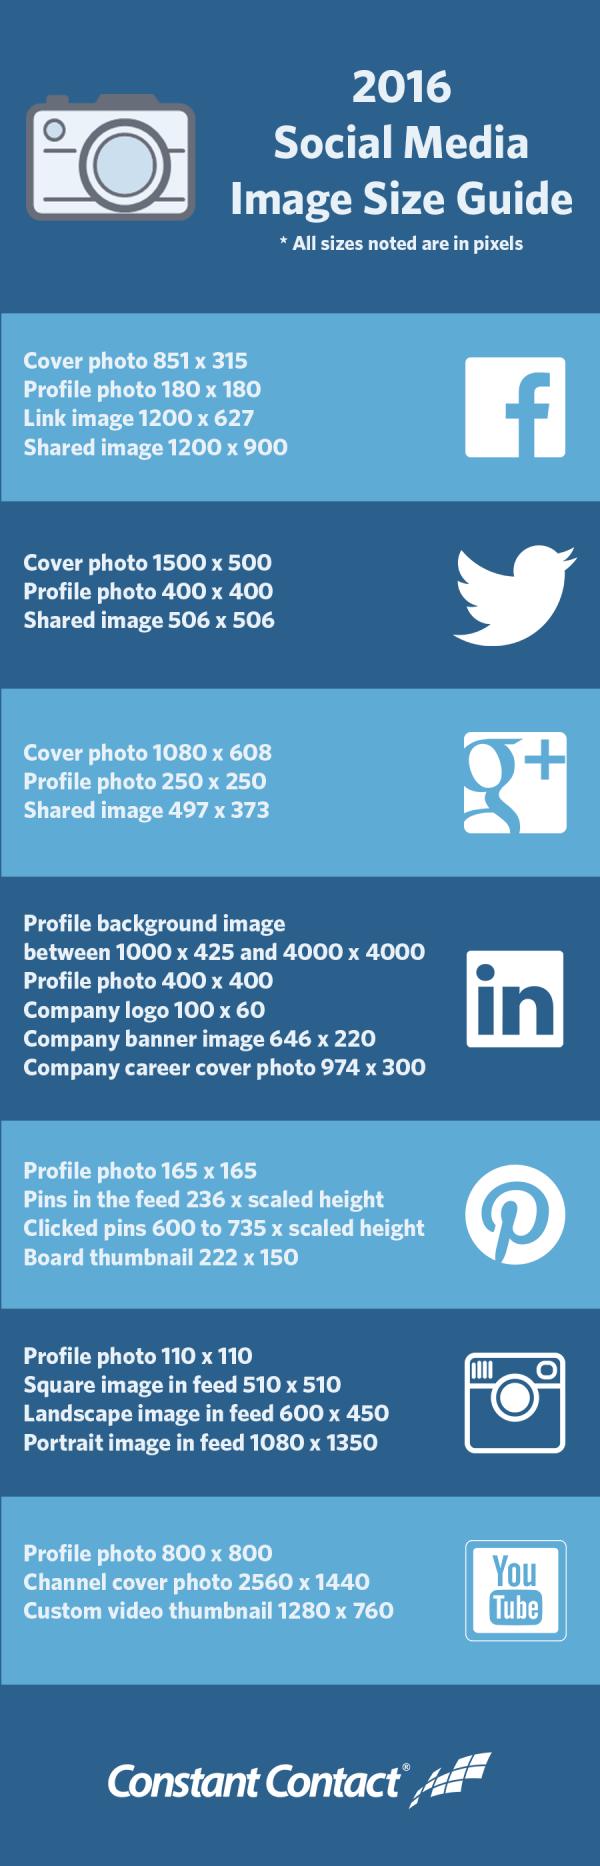 2016 Social Media Image Size Sheet